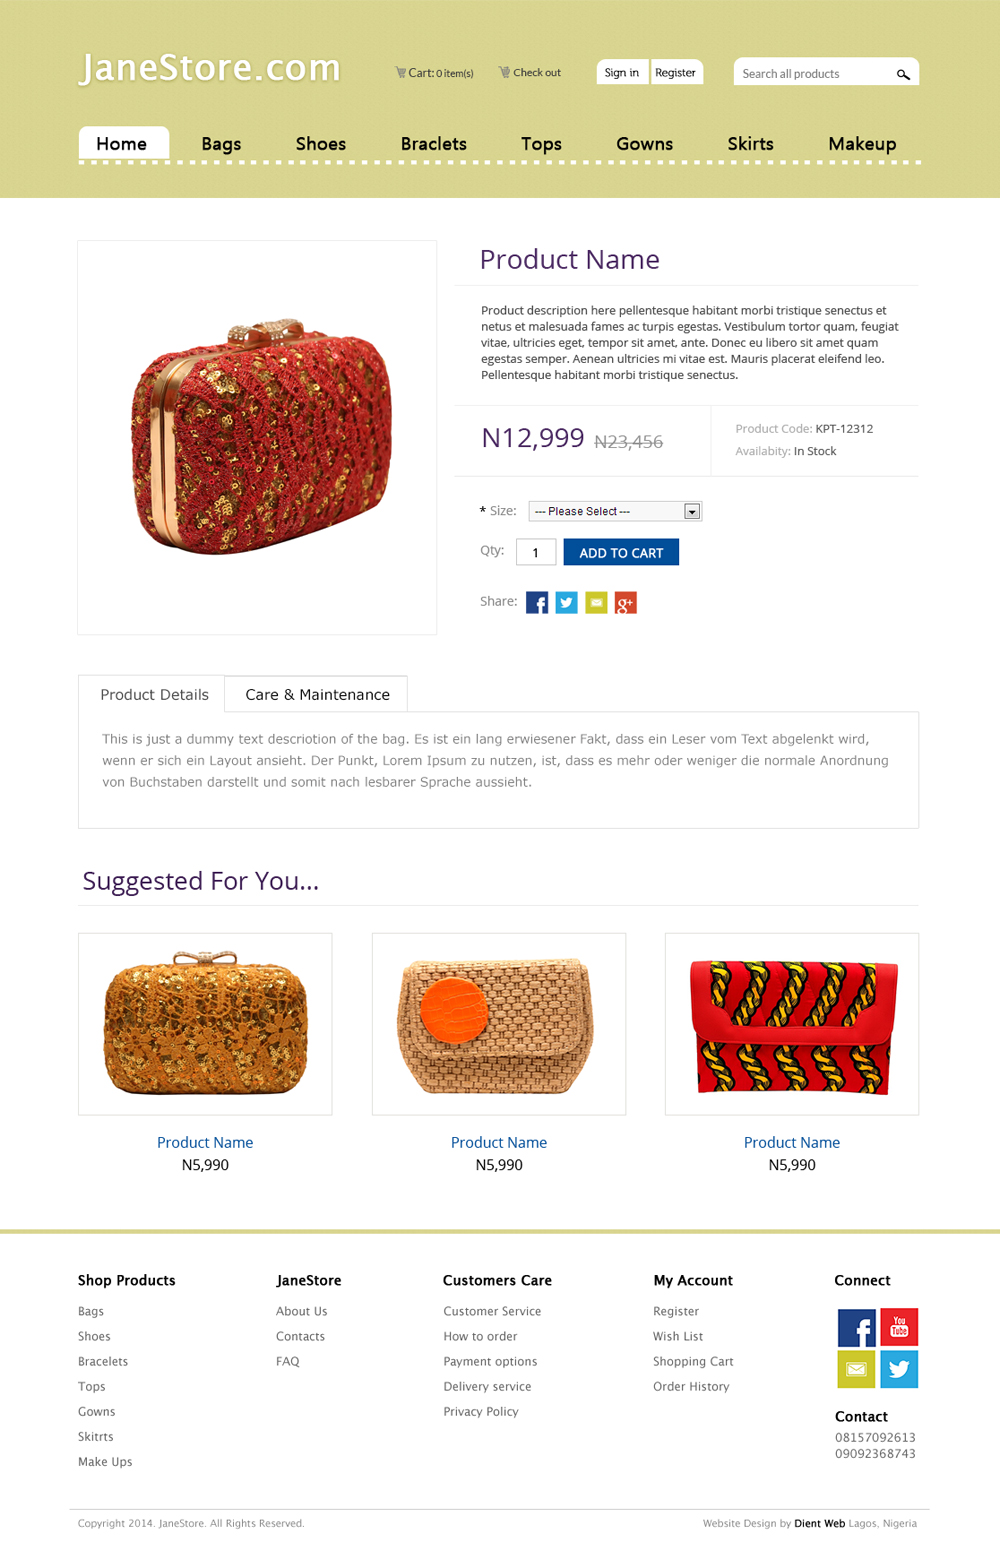 ecommerce website design - Janestore product page design